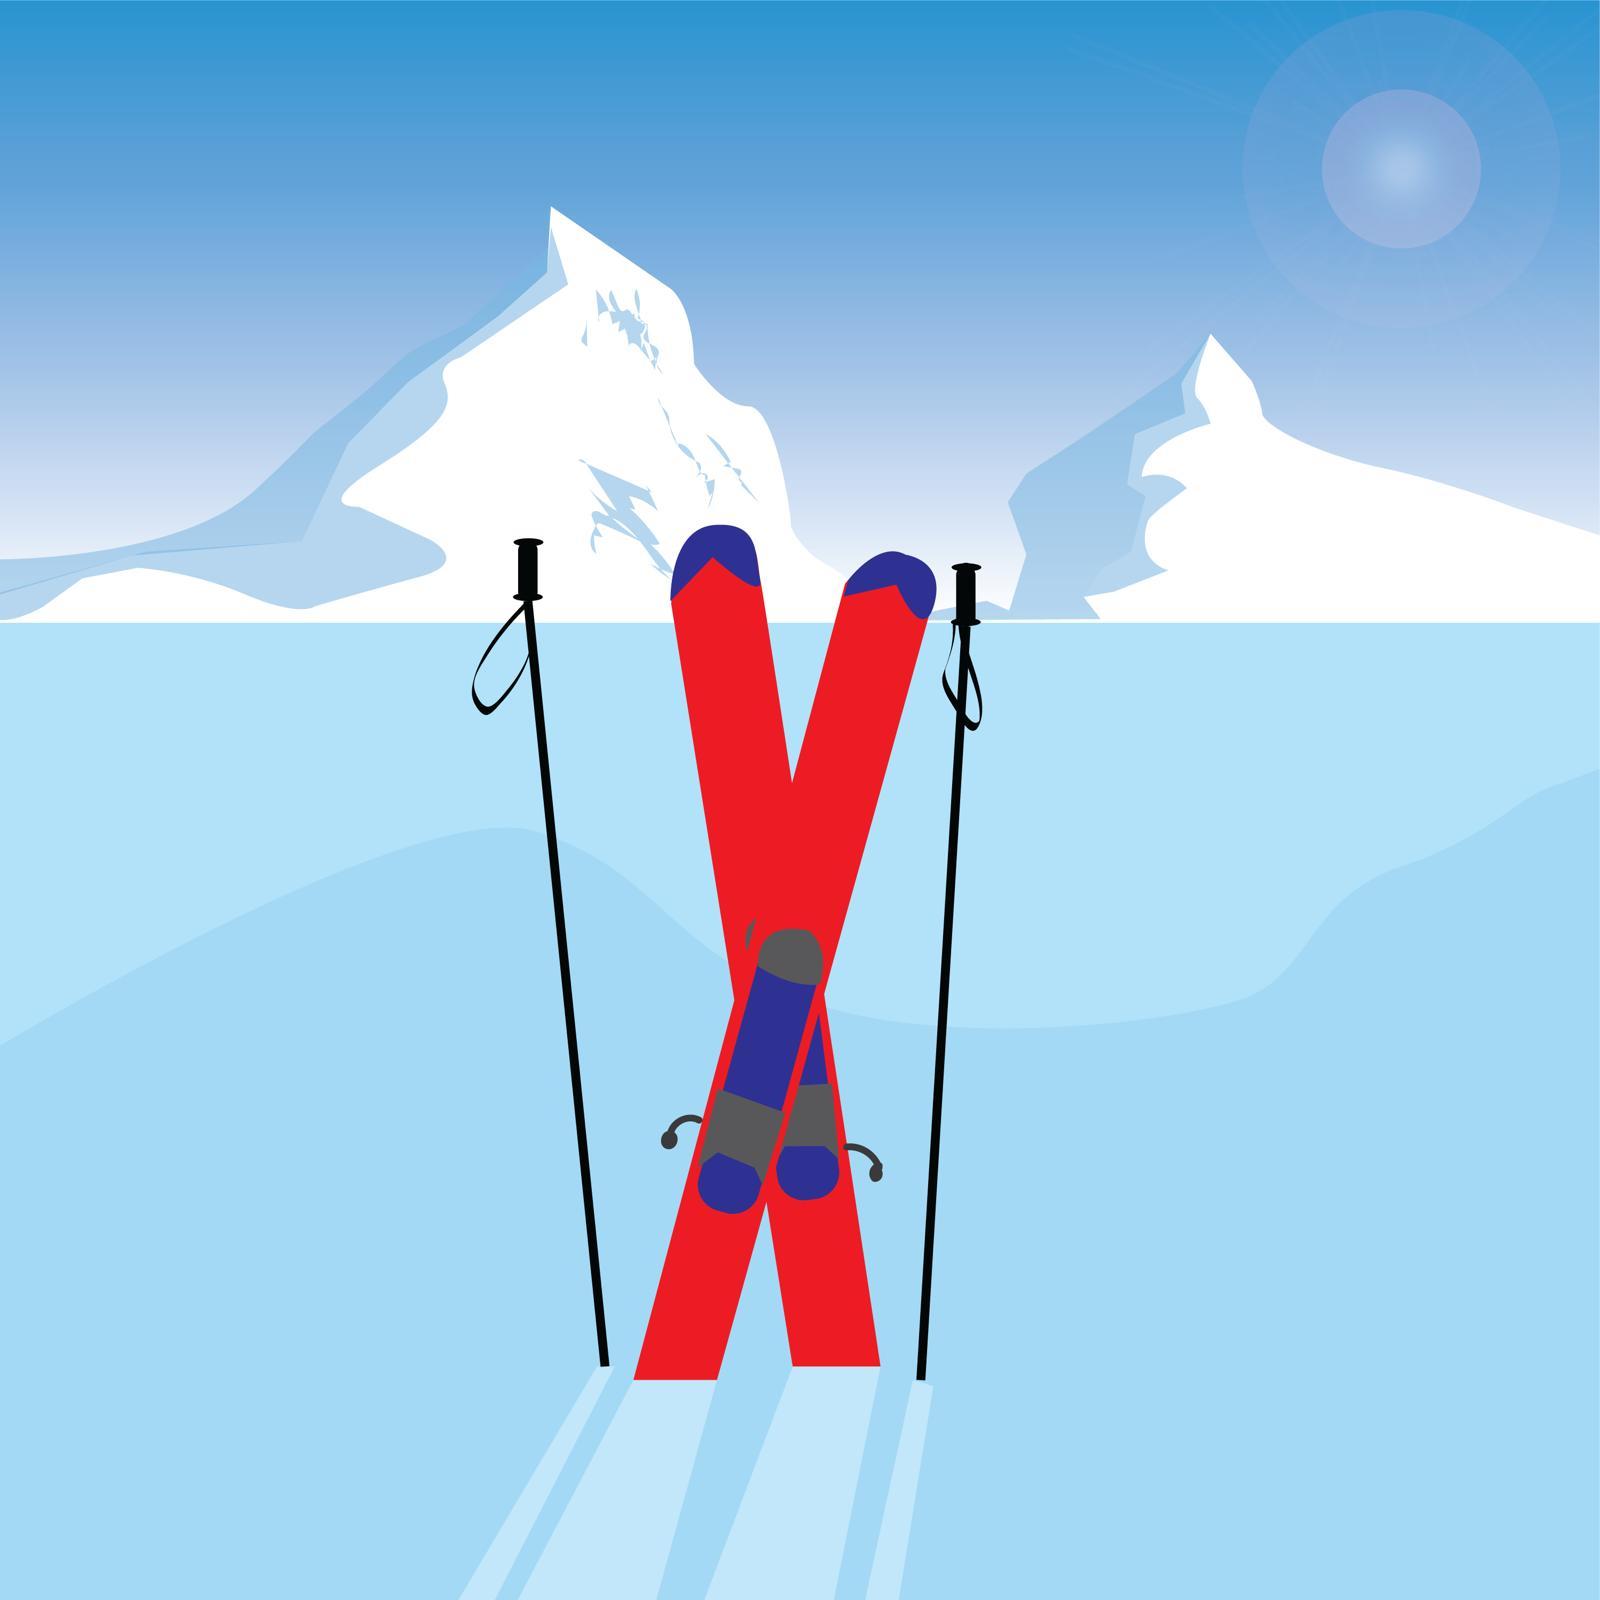 Gabrielle Archuleta illustration for 360 MAGAZINE skiing article